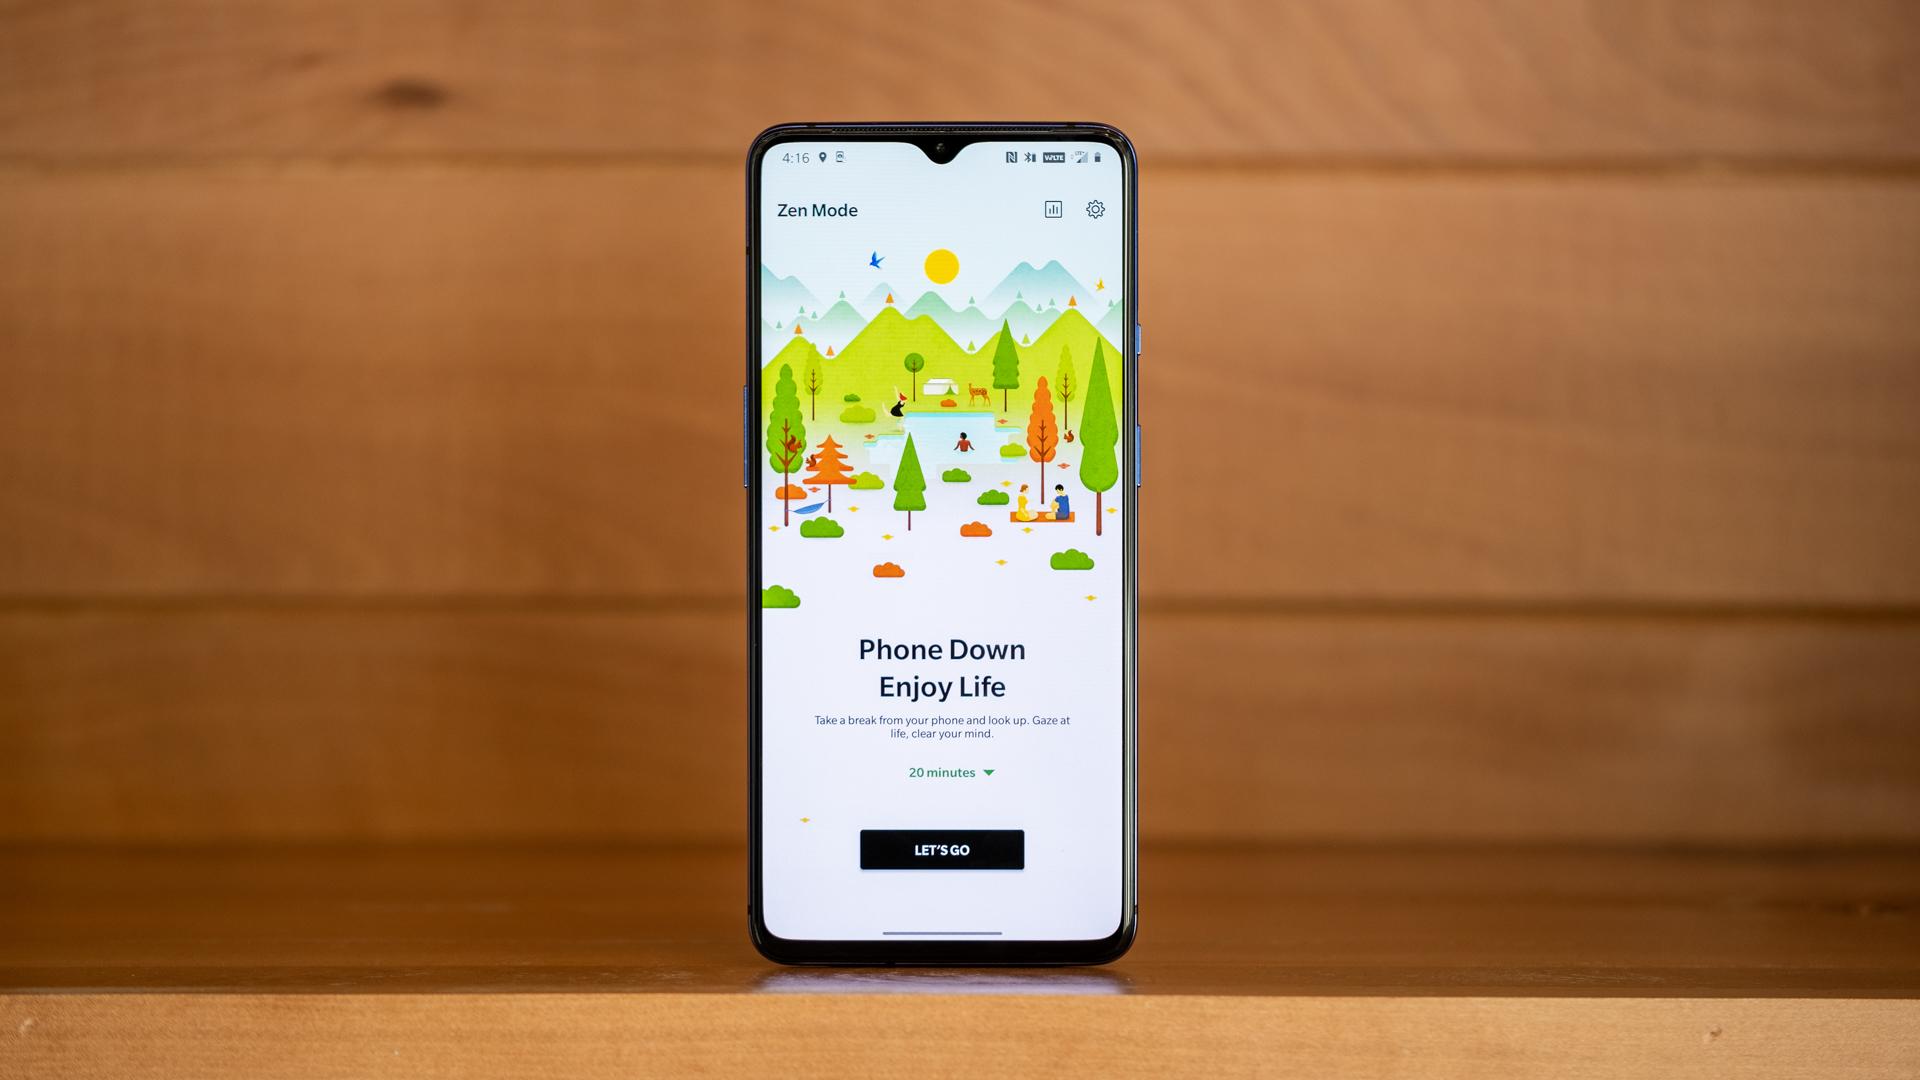 OnePlus 7T Zen Mode